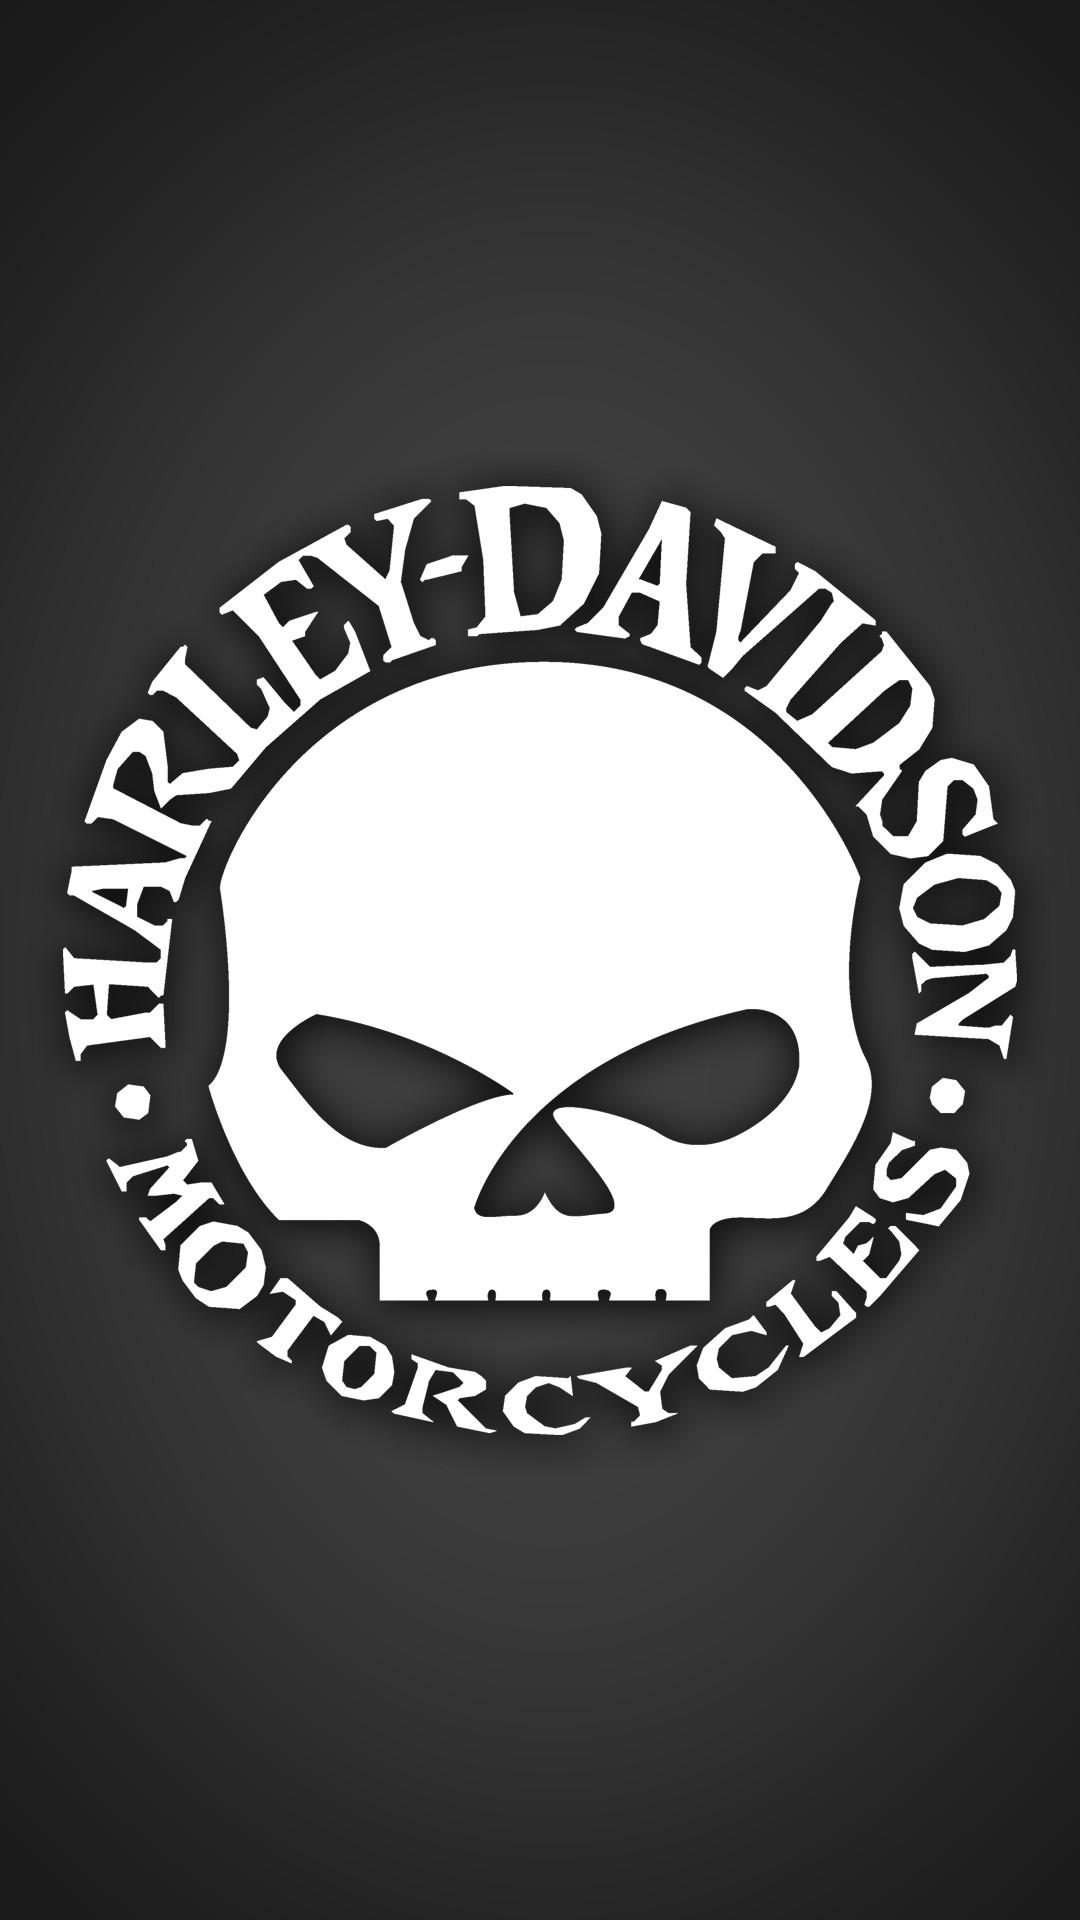 Harley Davidson Cell Phone Wallpaper Free